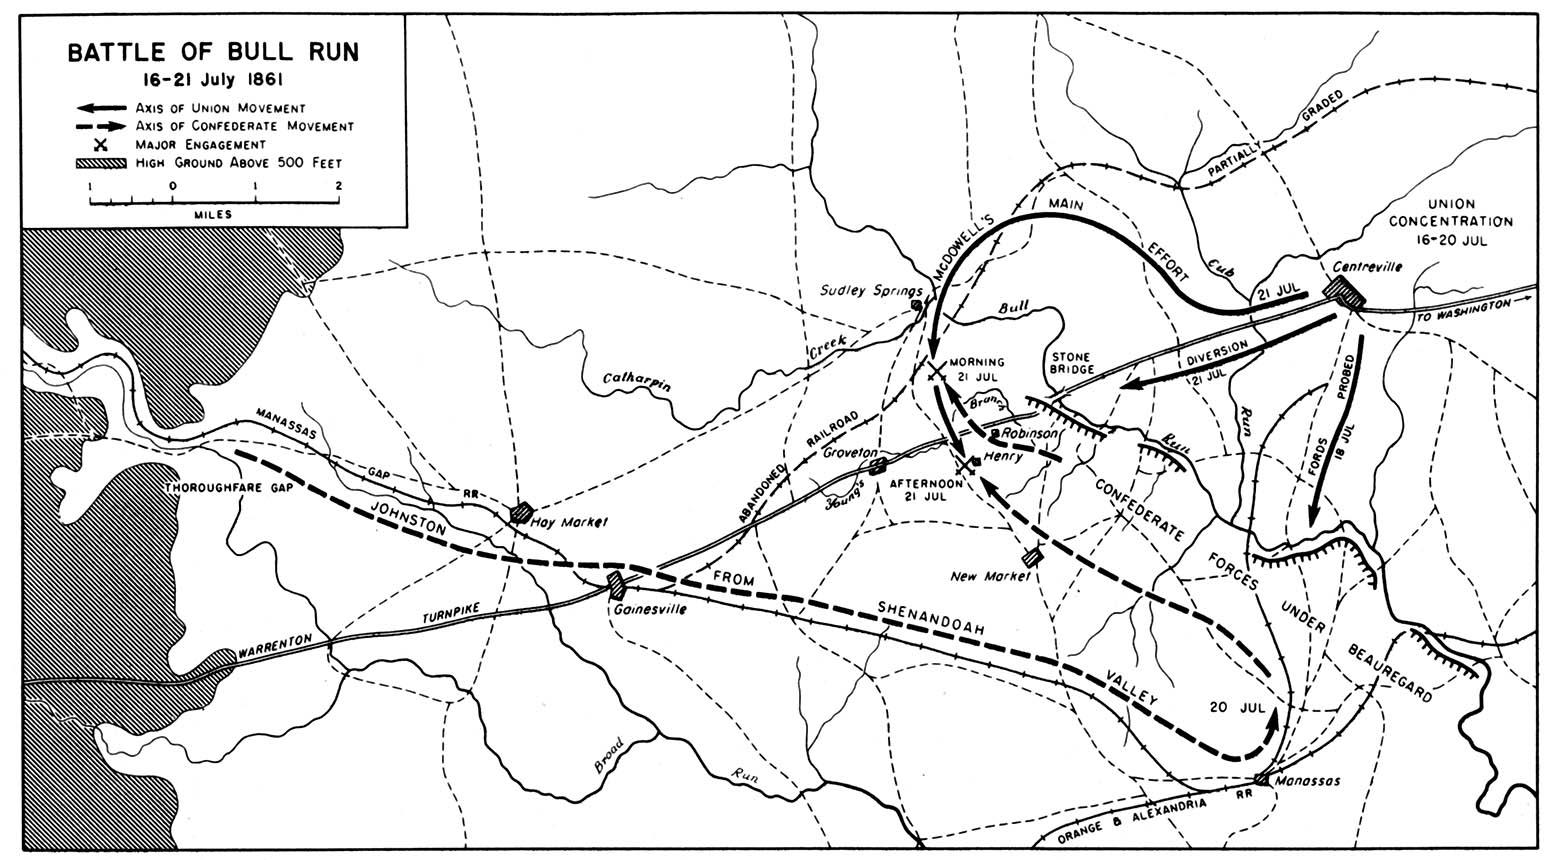 File:Battle of Bull Run map.png - Wikimedia Commons